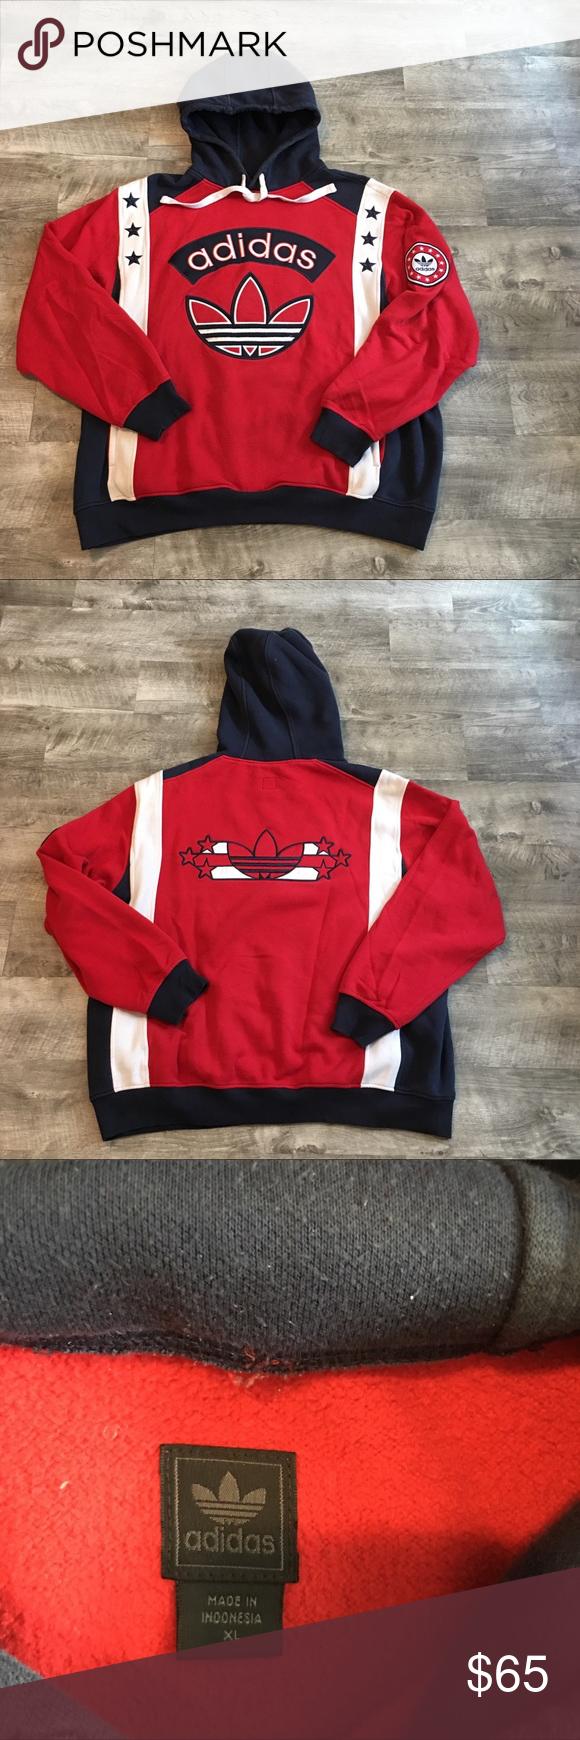 Adidas retro stars stripes trefoil hoodie size xl adidas retro